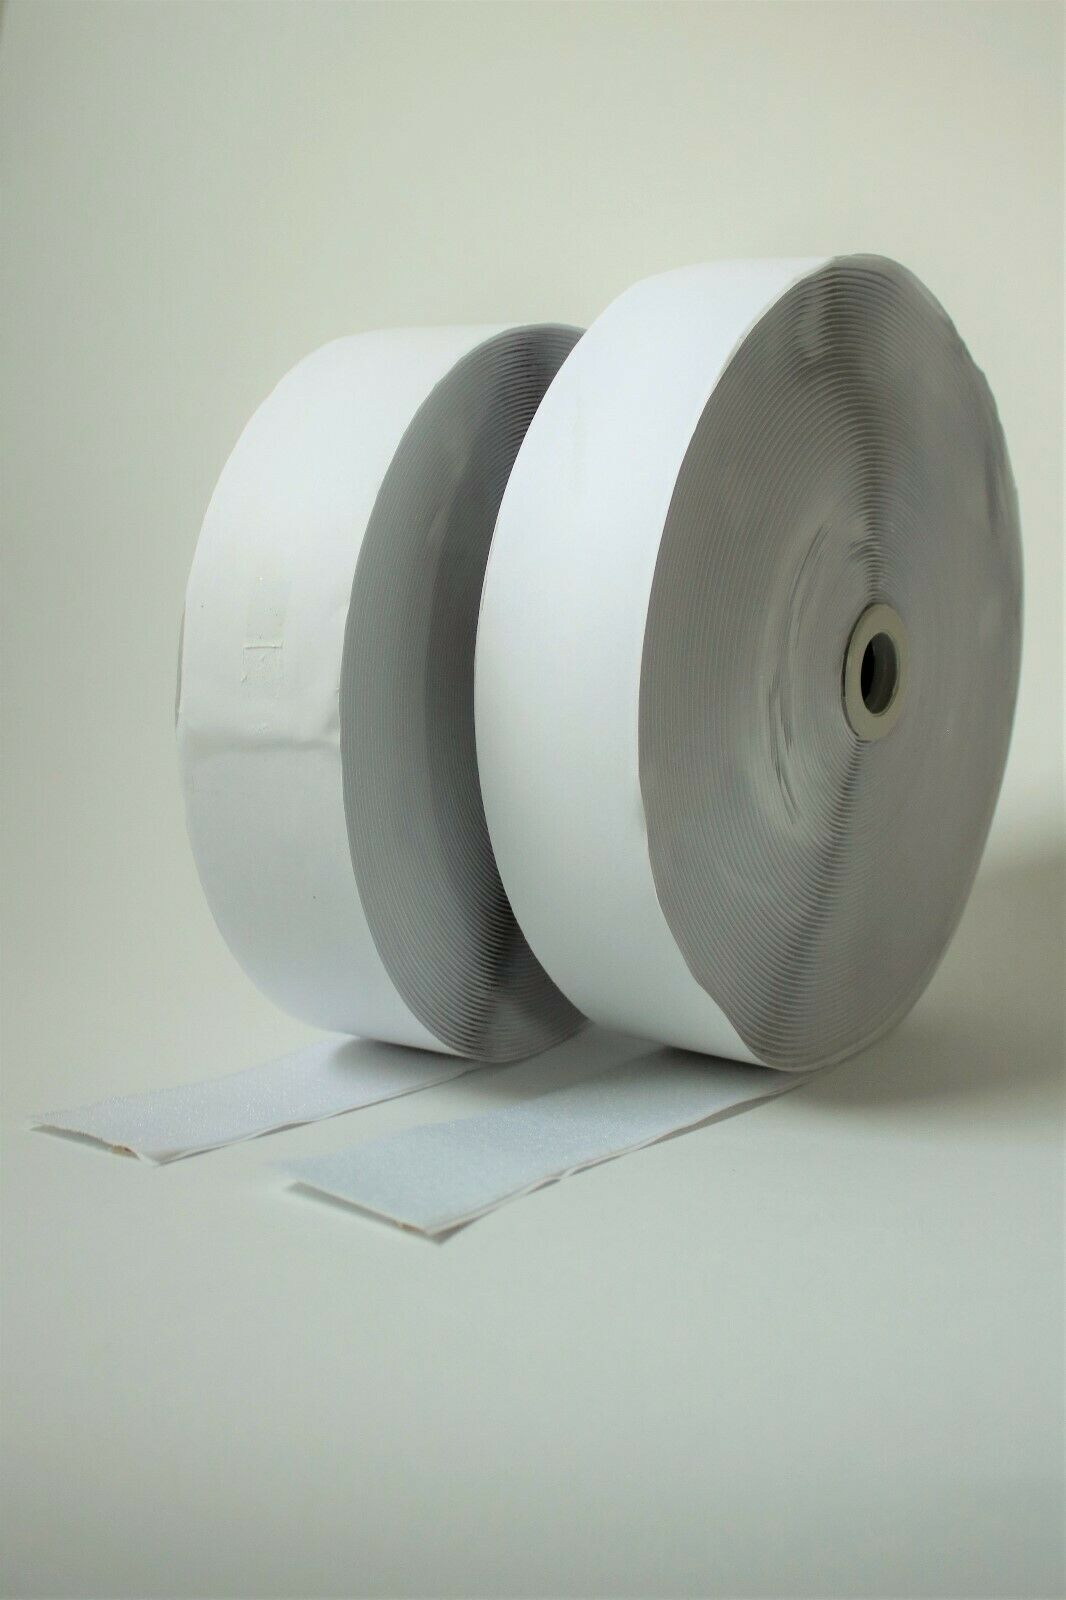 Nastro Velcro FELPATE E GANCI BIANCO 50mm x 25m